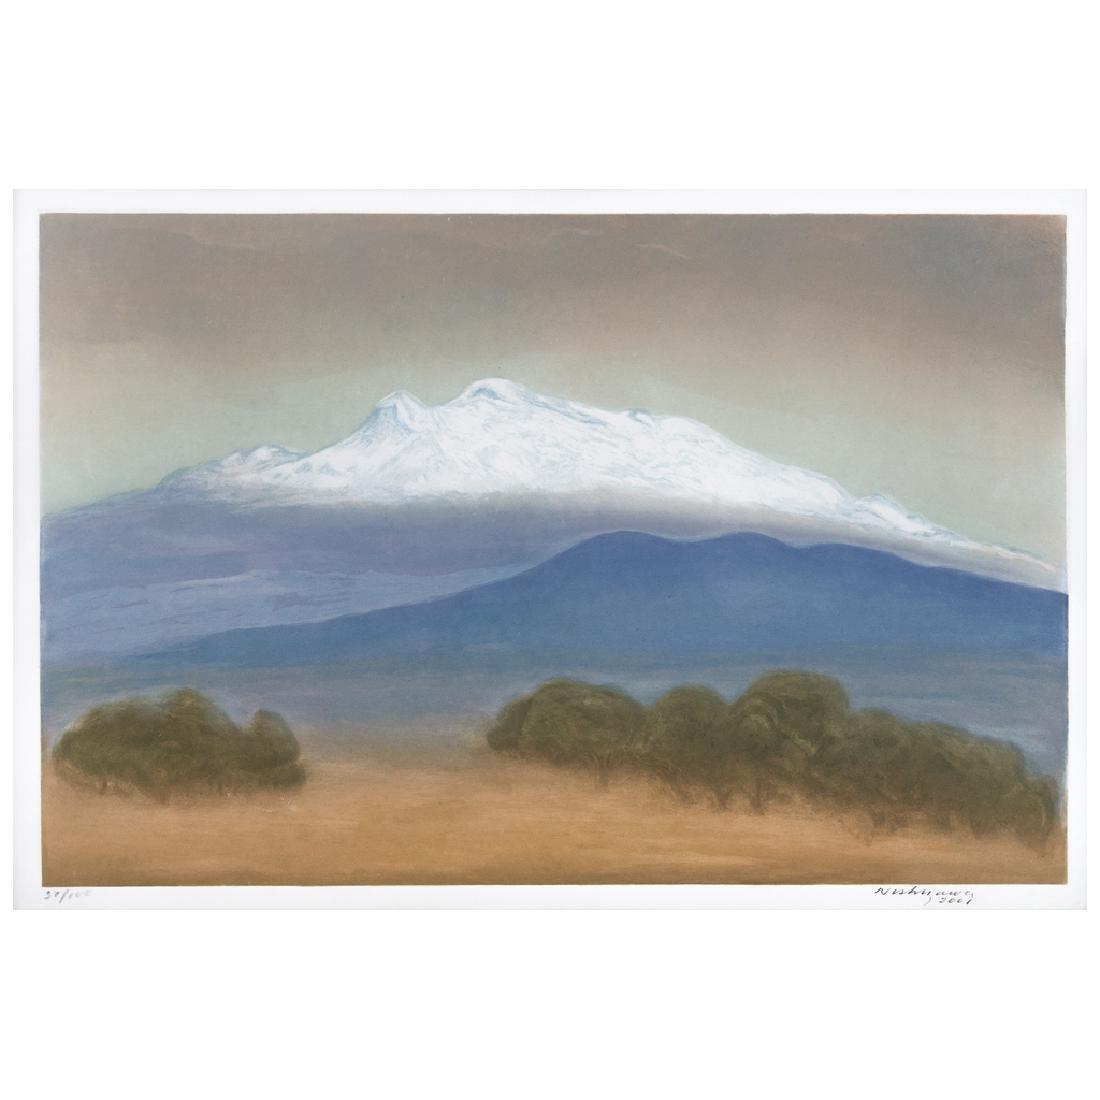 LUIS NISHIZAWA, Iztaccihuatl, Signed, Engraving, 37 /